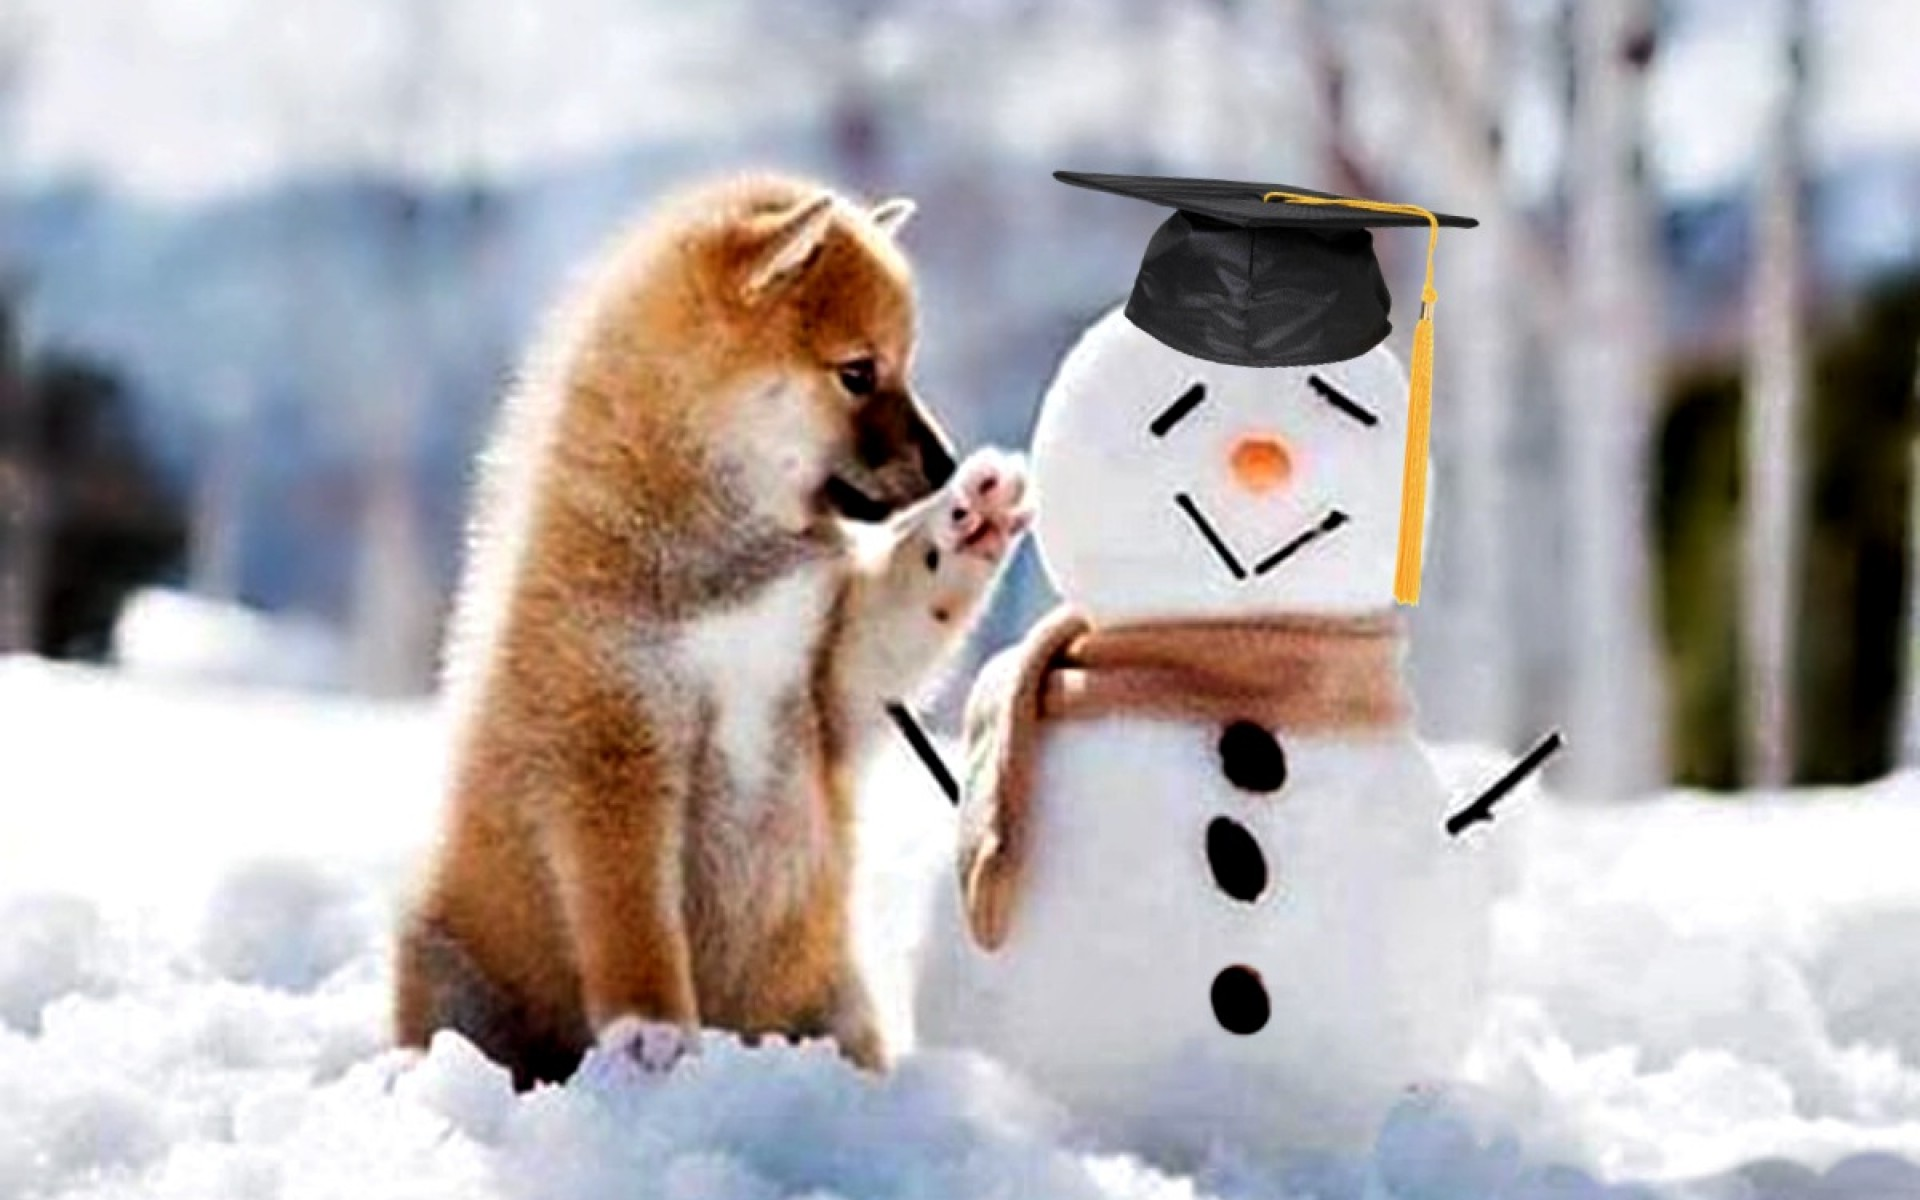 Adorable In Snow Wallpaper